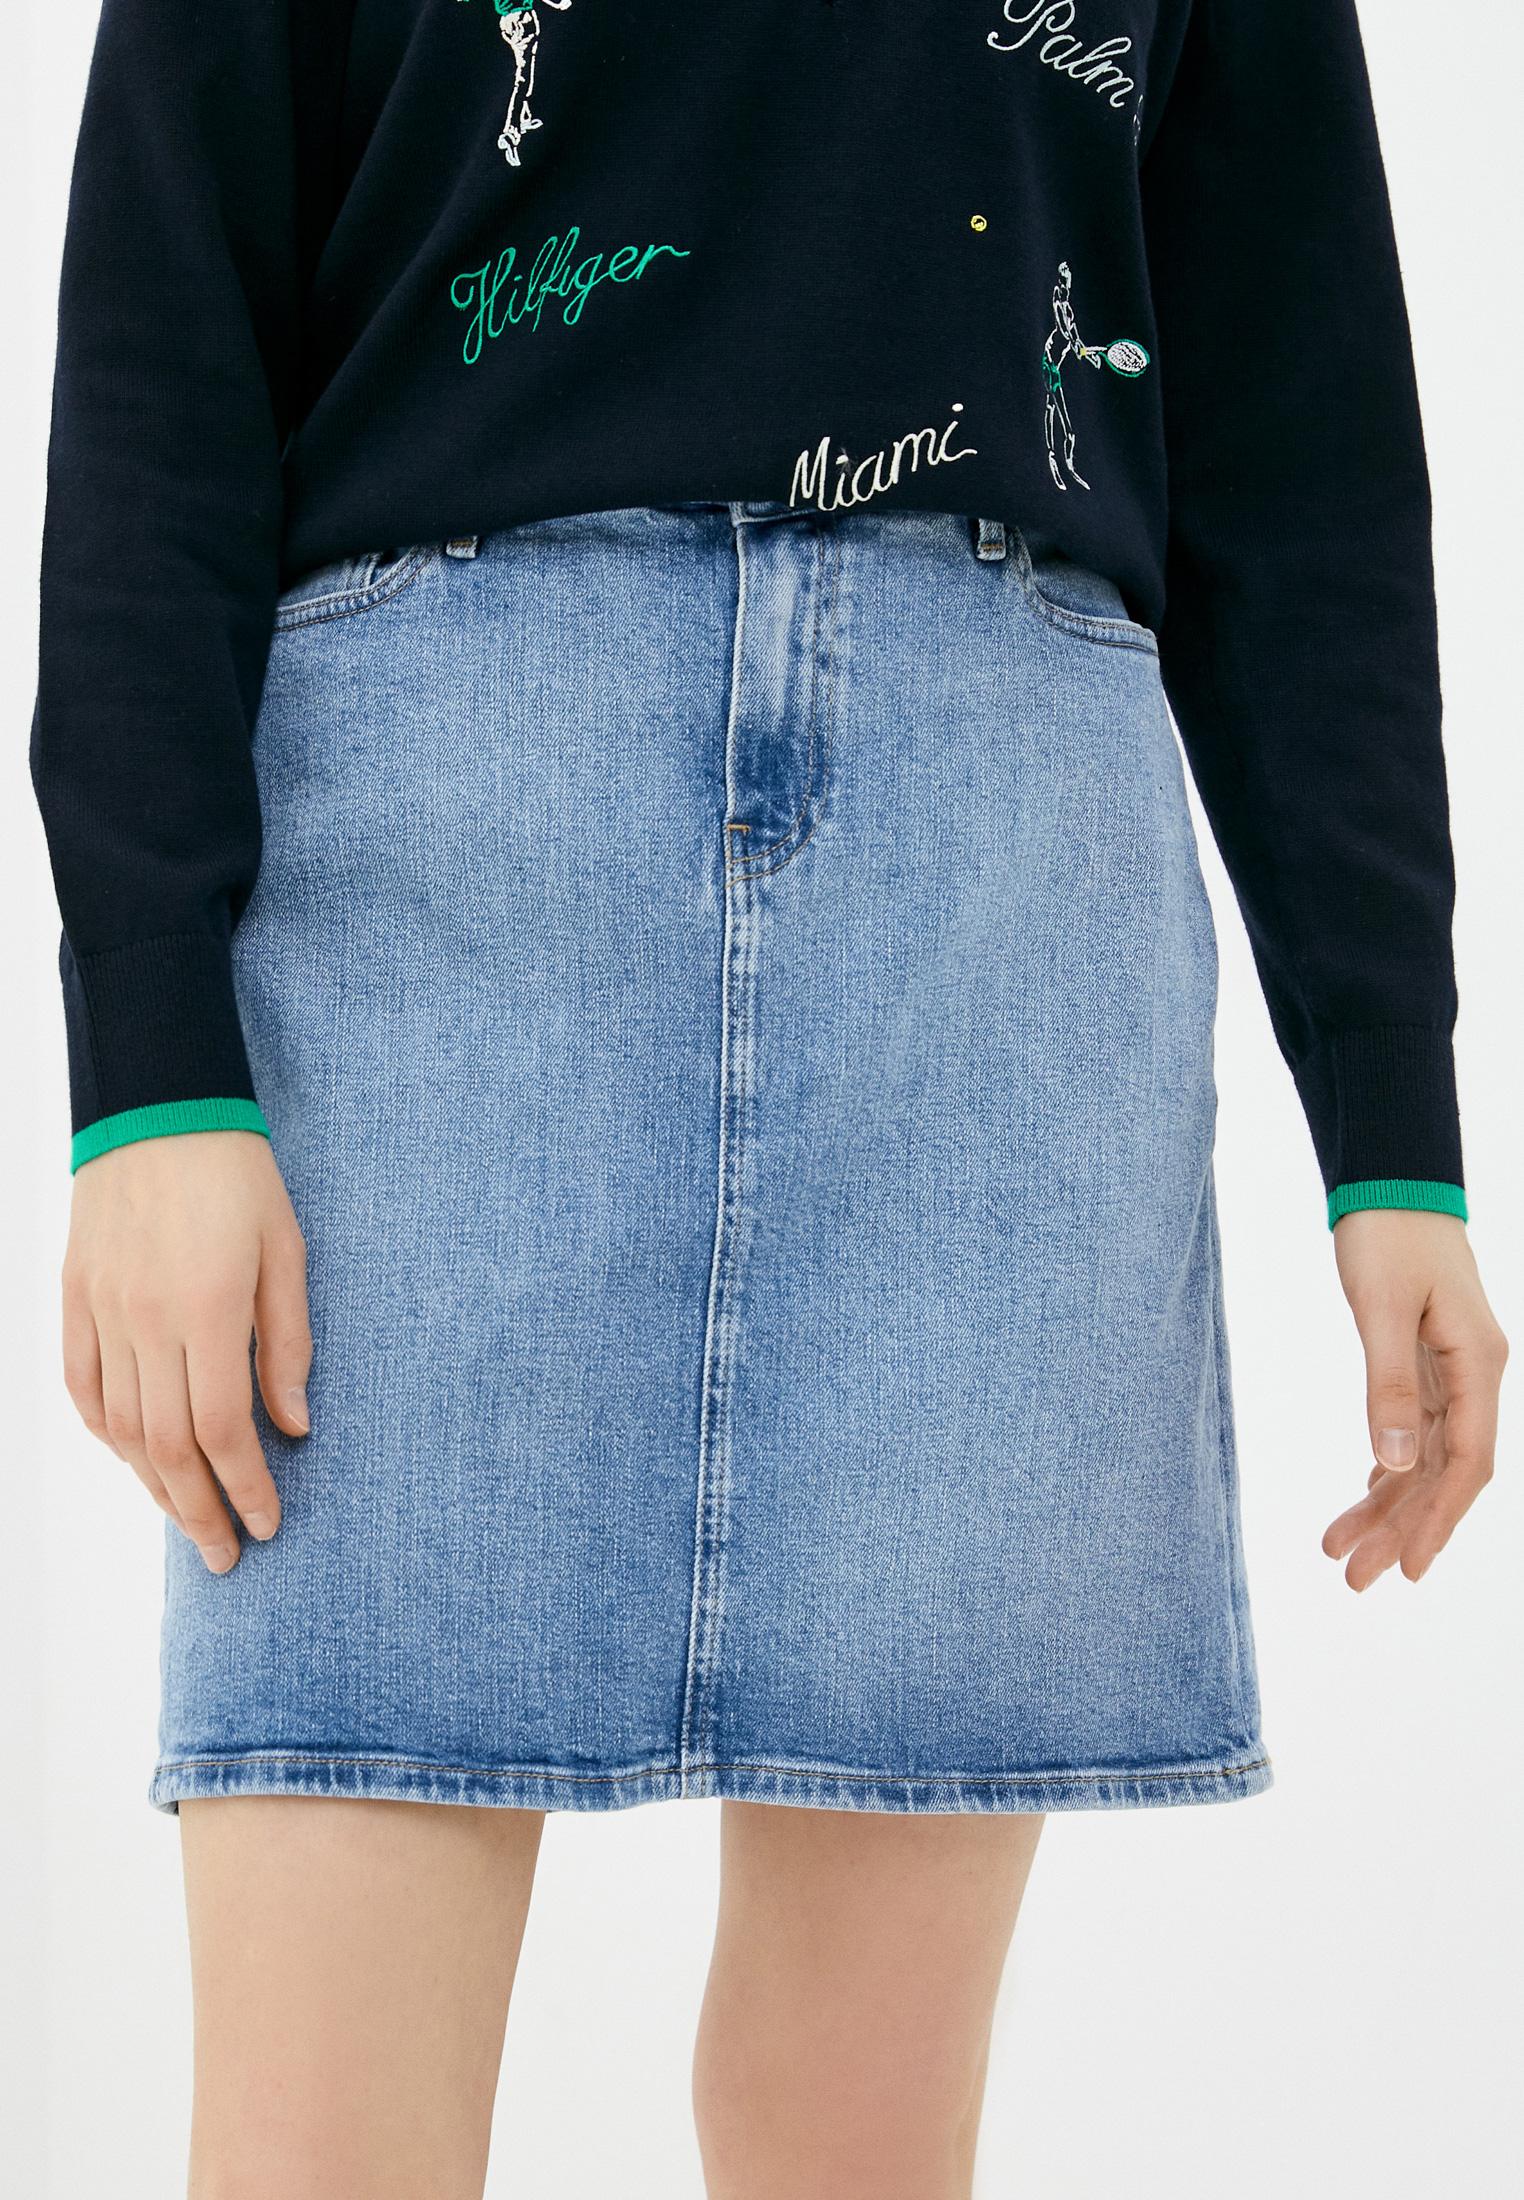 Джинсовая юбка Tommy Hilfiger (Томми Хилфигер) WW0WW30818